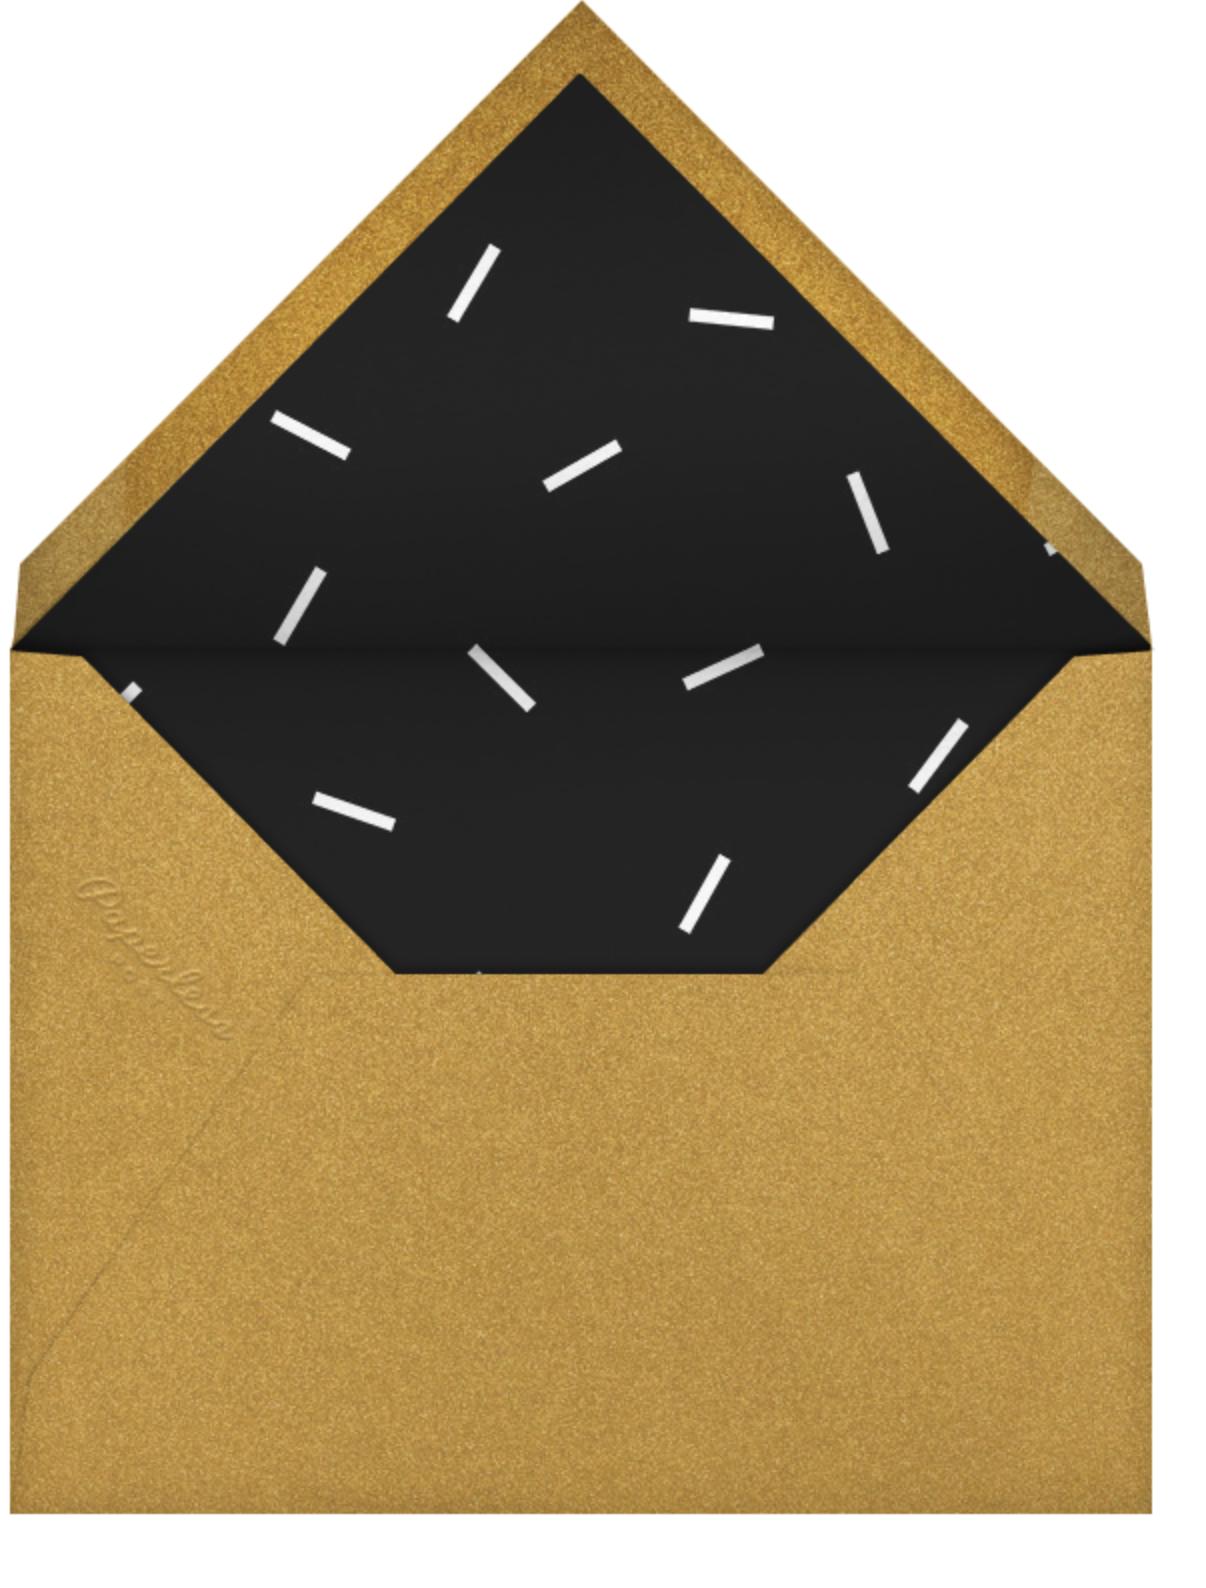 Confection - Gold - Paperless Post - Milestone  - envelope back